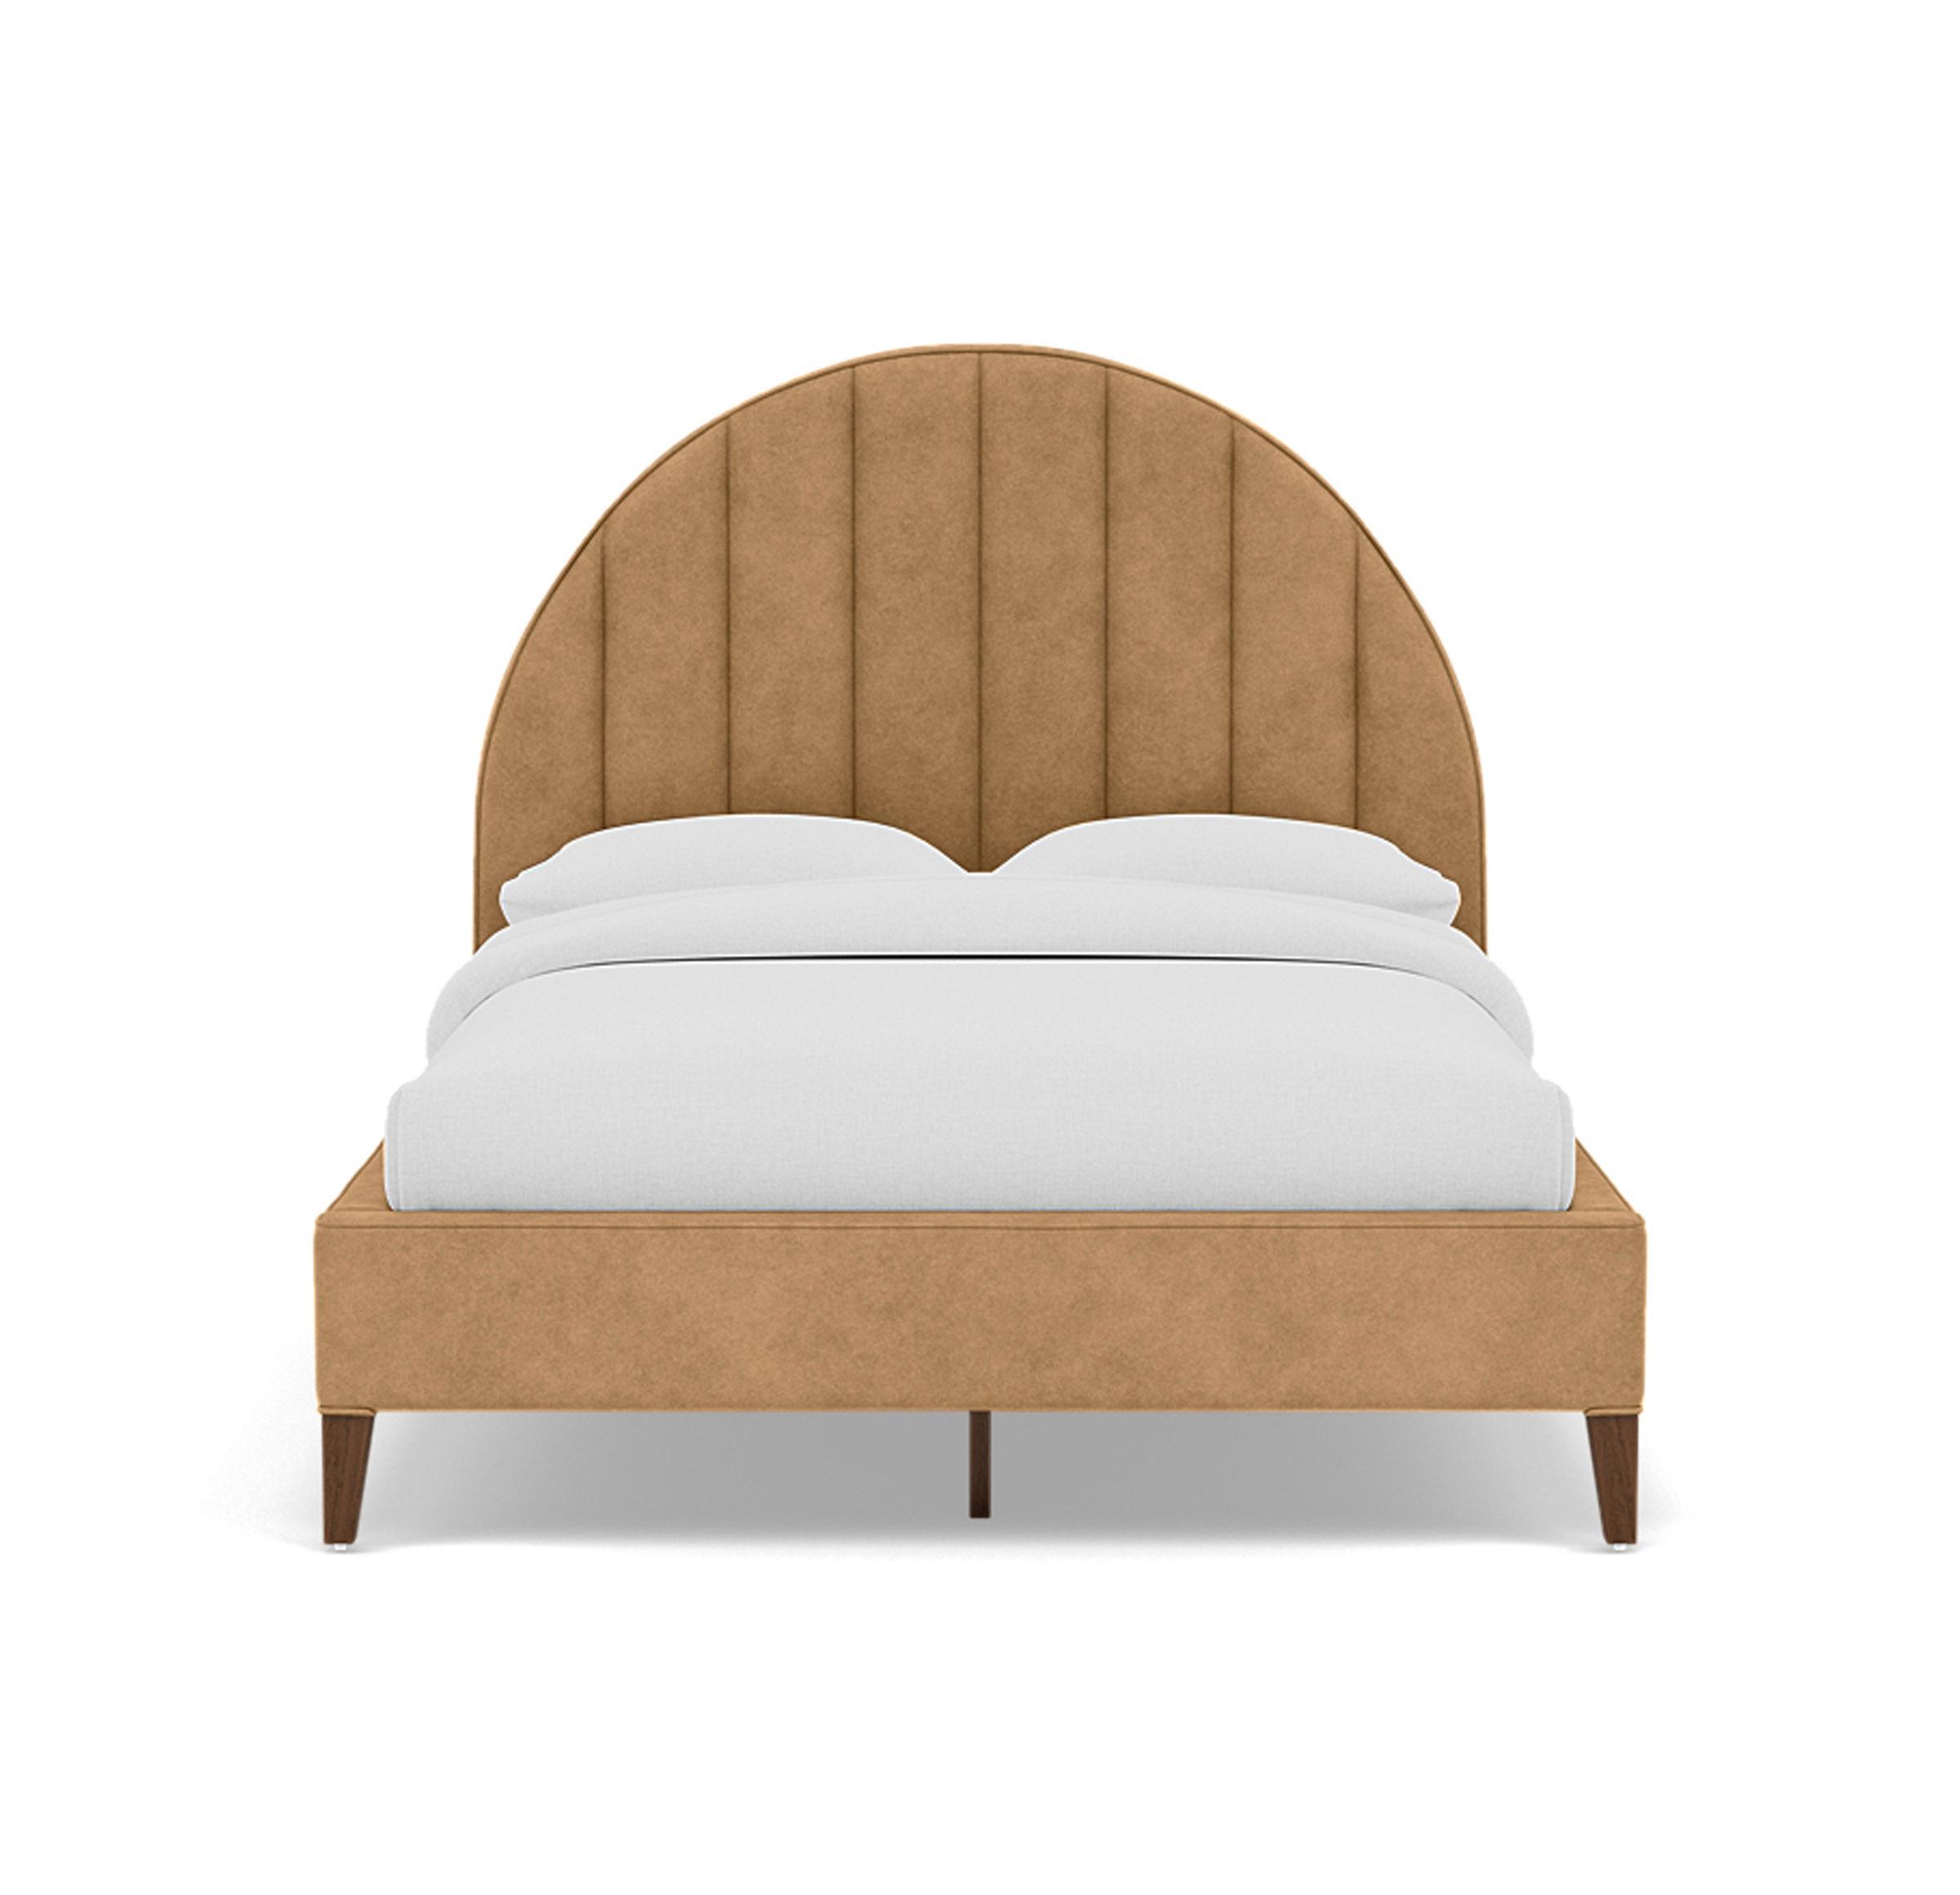 ARCHER LEATHER CHANNEL BED, MOAB - DESERT, hi-res